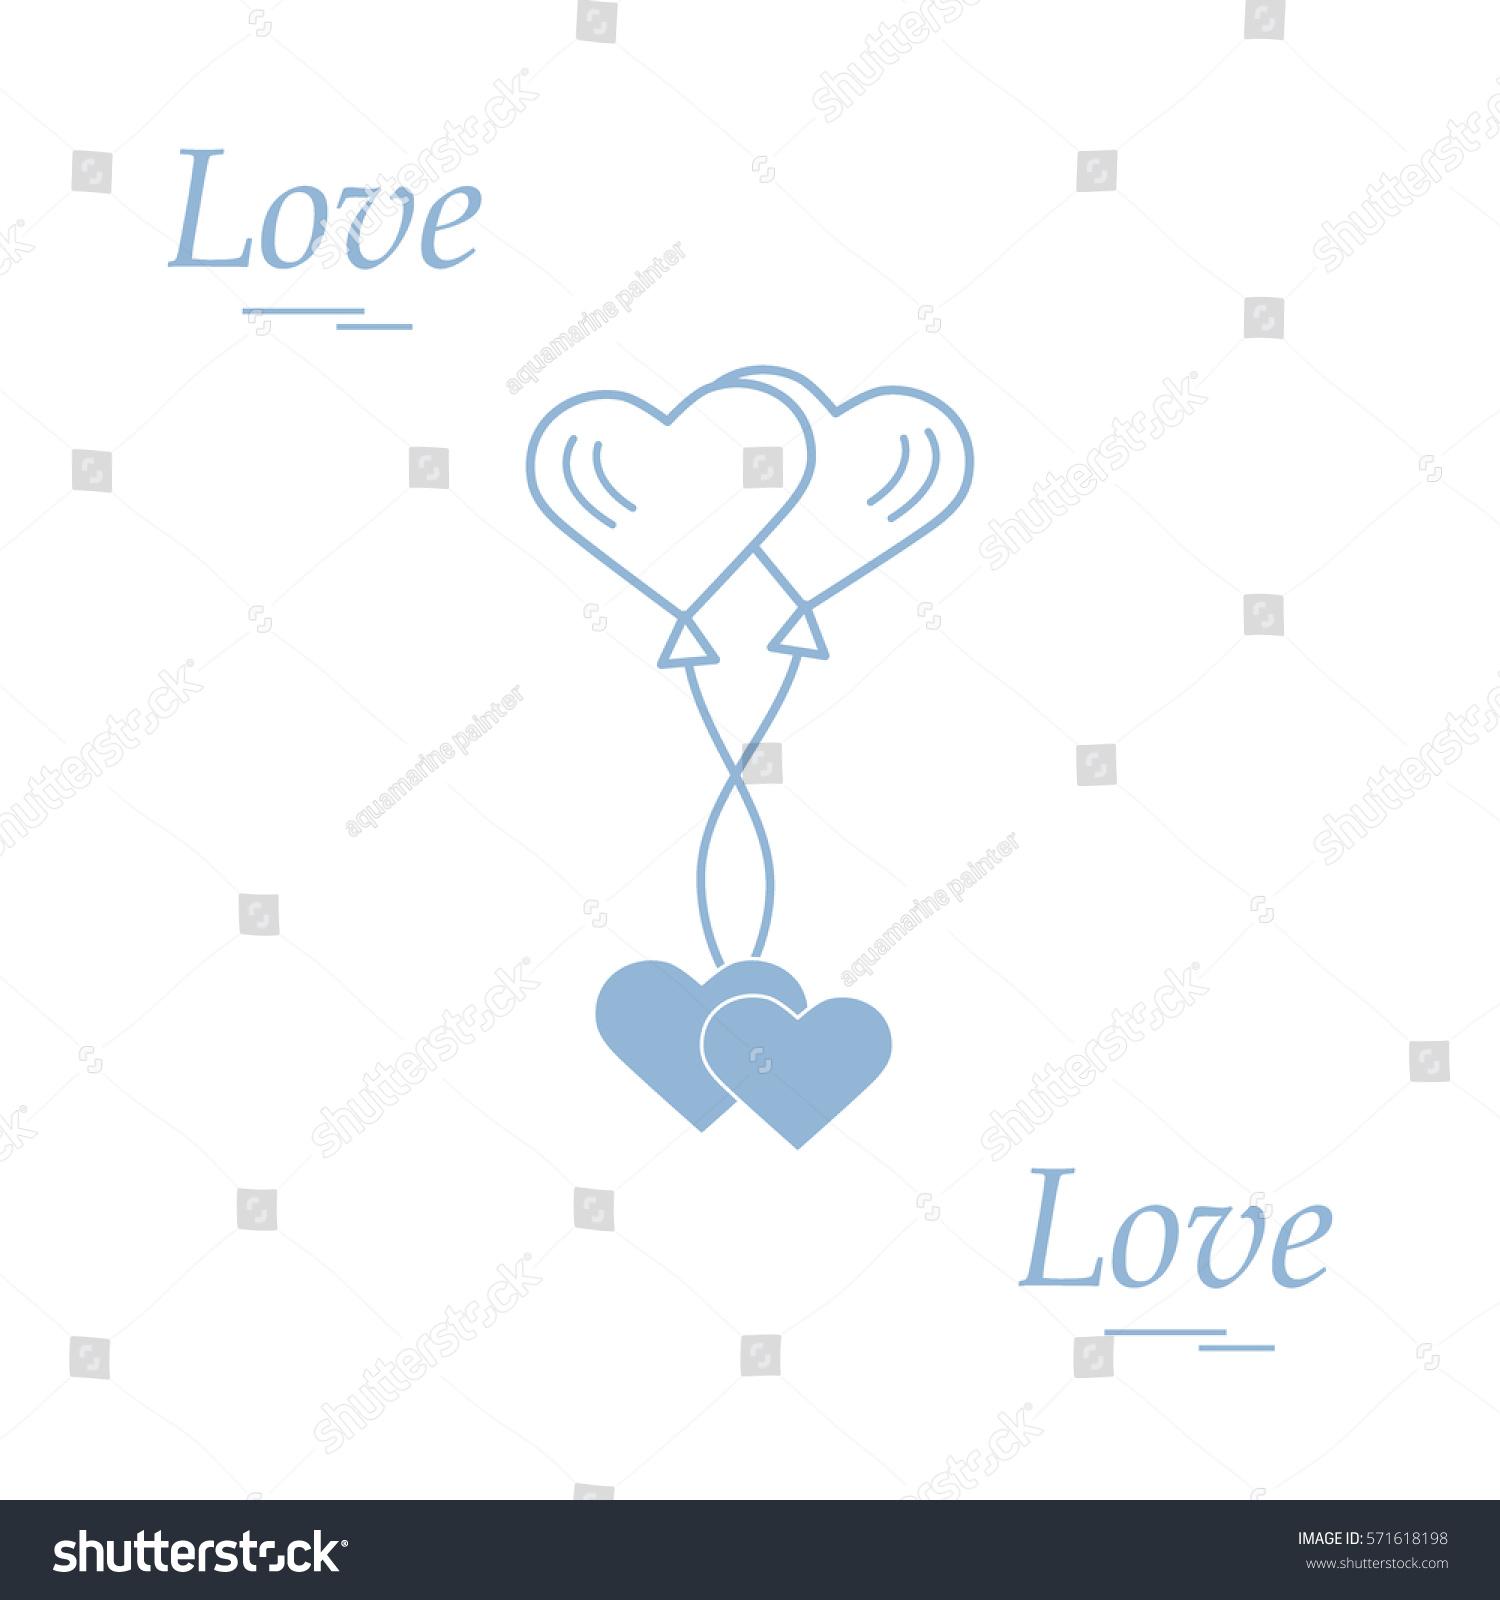 Cute vector illustration love symbols heart stock vector 571618198 cute vector illustration of love symbols heart air balloons icon and two hearts romantic biocorpaavc Choice Image